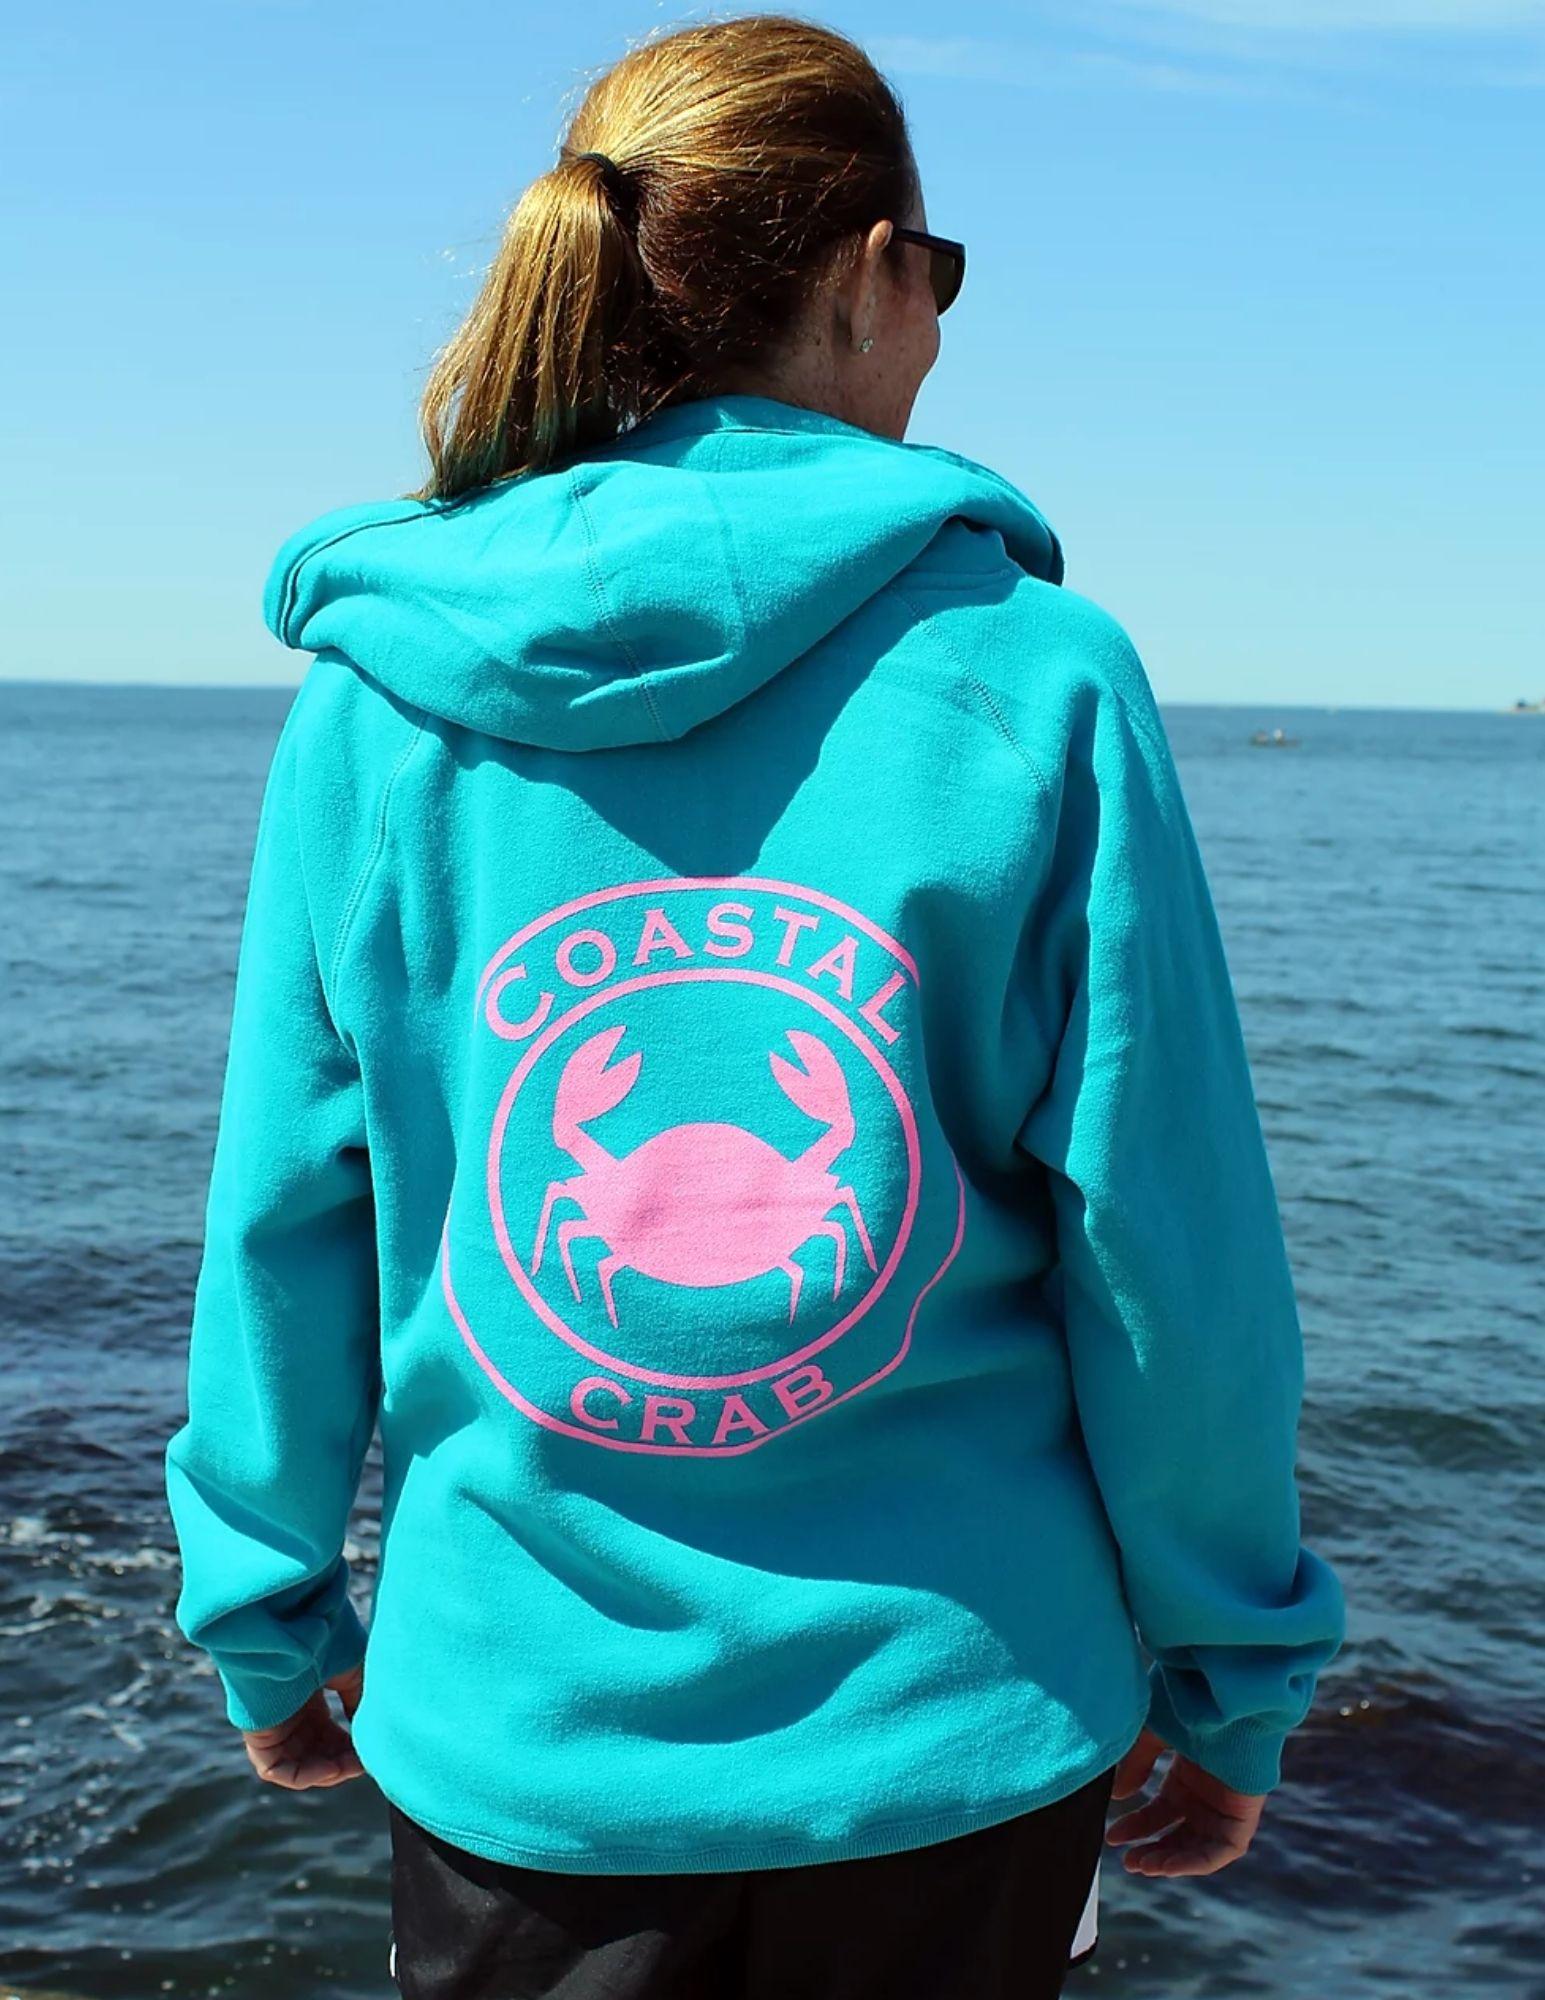 Coastal Crab CT Coastal Gifts on Main Niantic-16